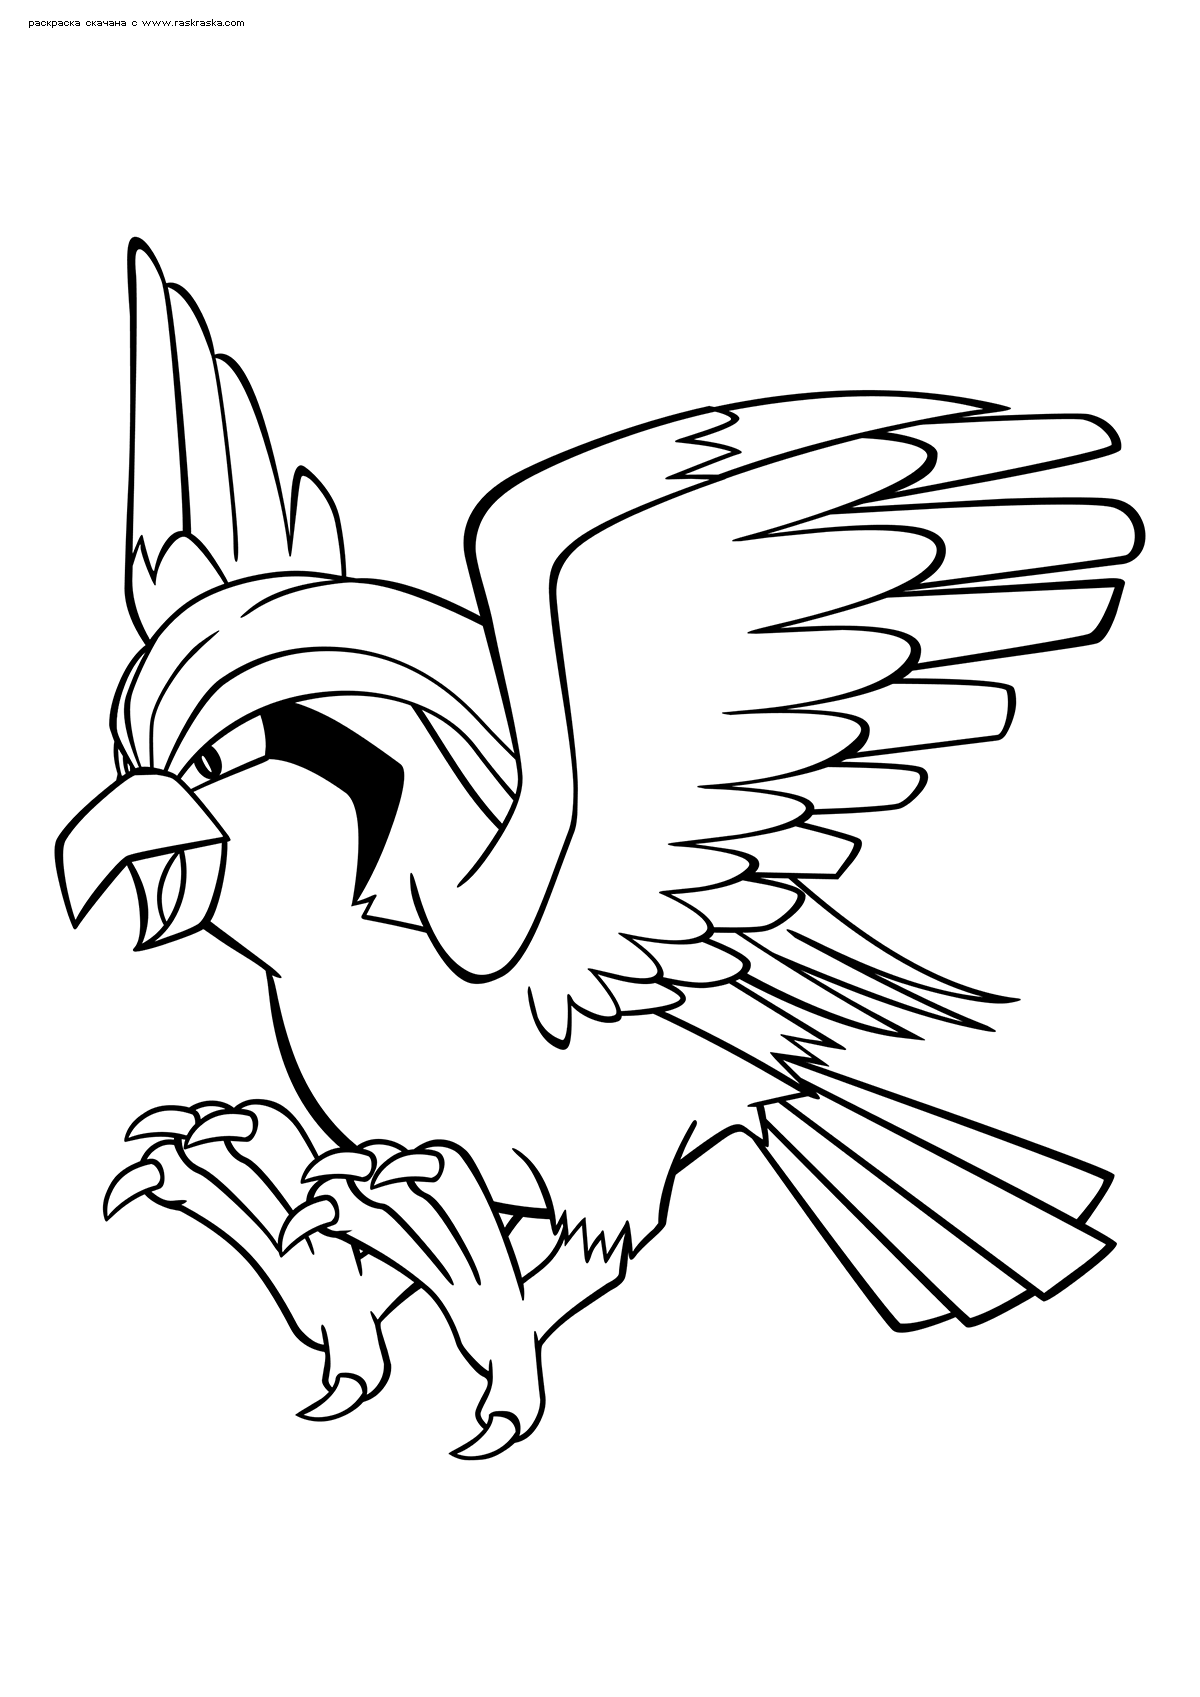 Раскраска Покемон Пиджеот (Pidgeot) | Раскраски эволюция ...